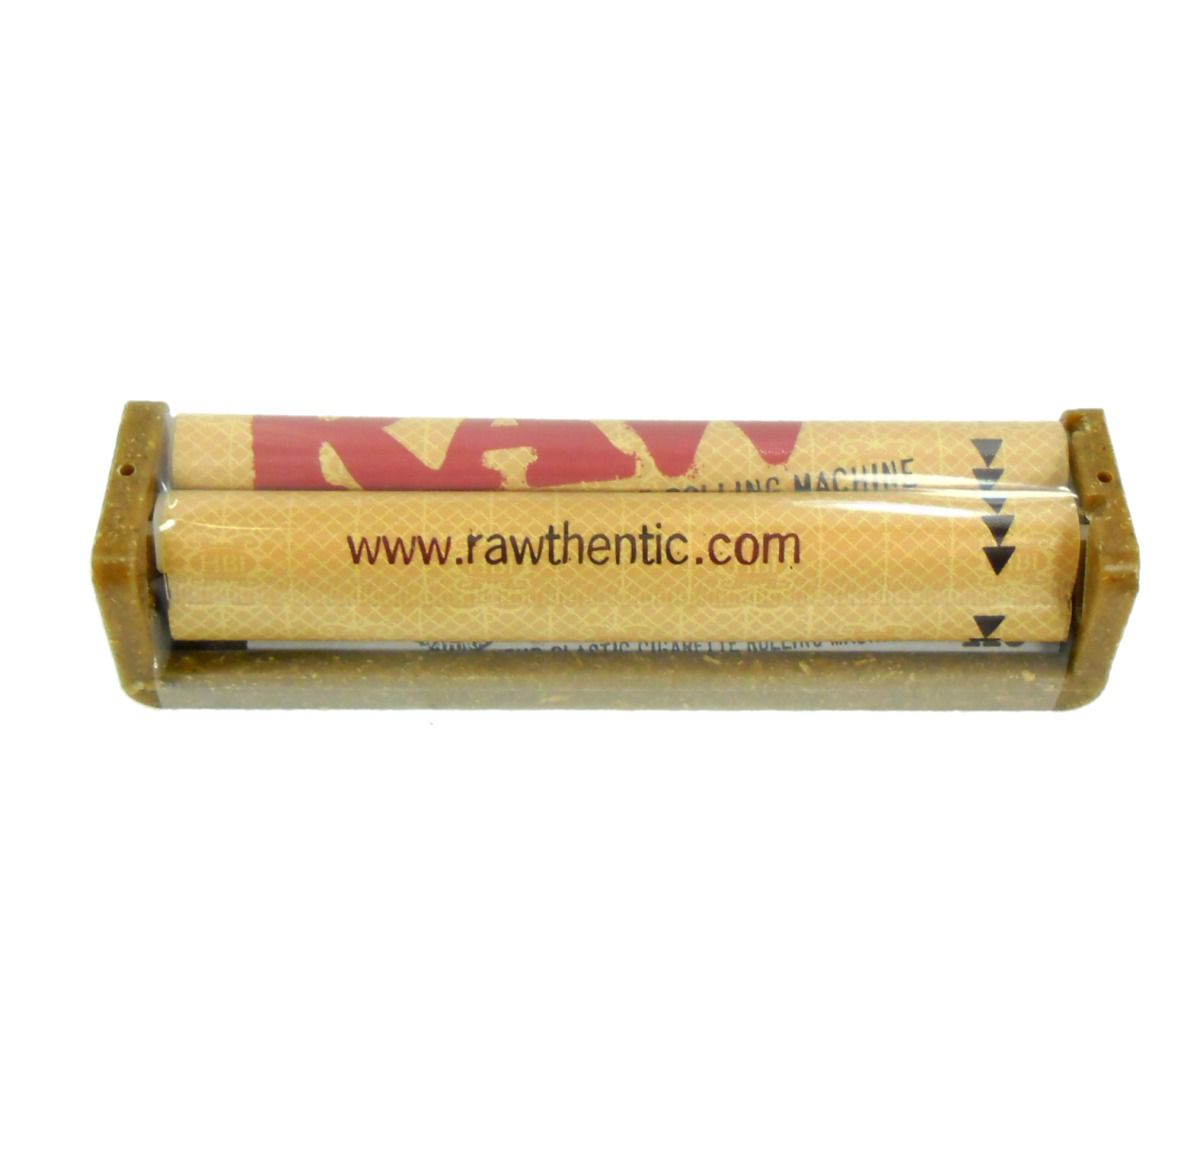 Bolador de fumo / Máquina Para Enrolar Cigarros RAW 110mm, feita de fibras de coco.